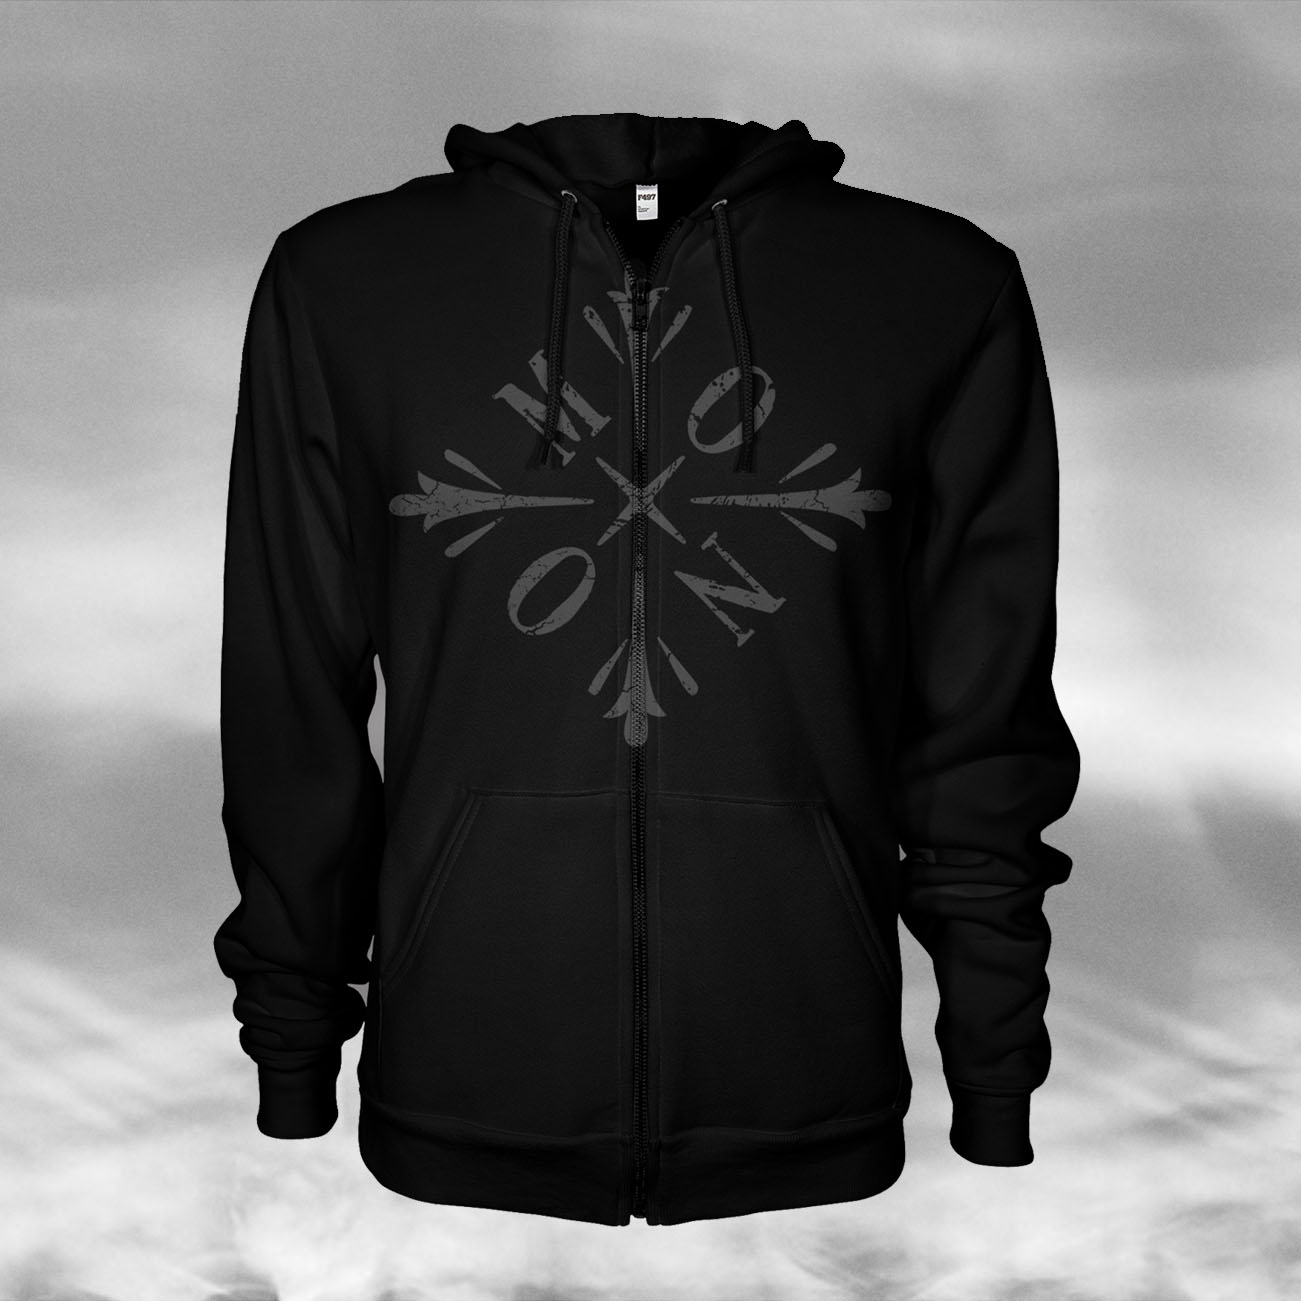 MONO - 'Snowflake' Zipped Hoody - MONO